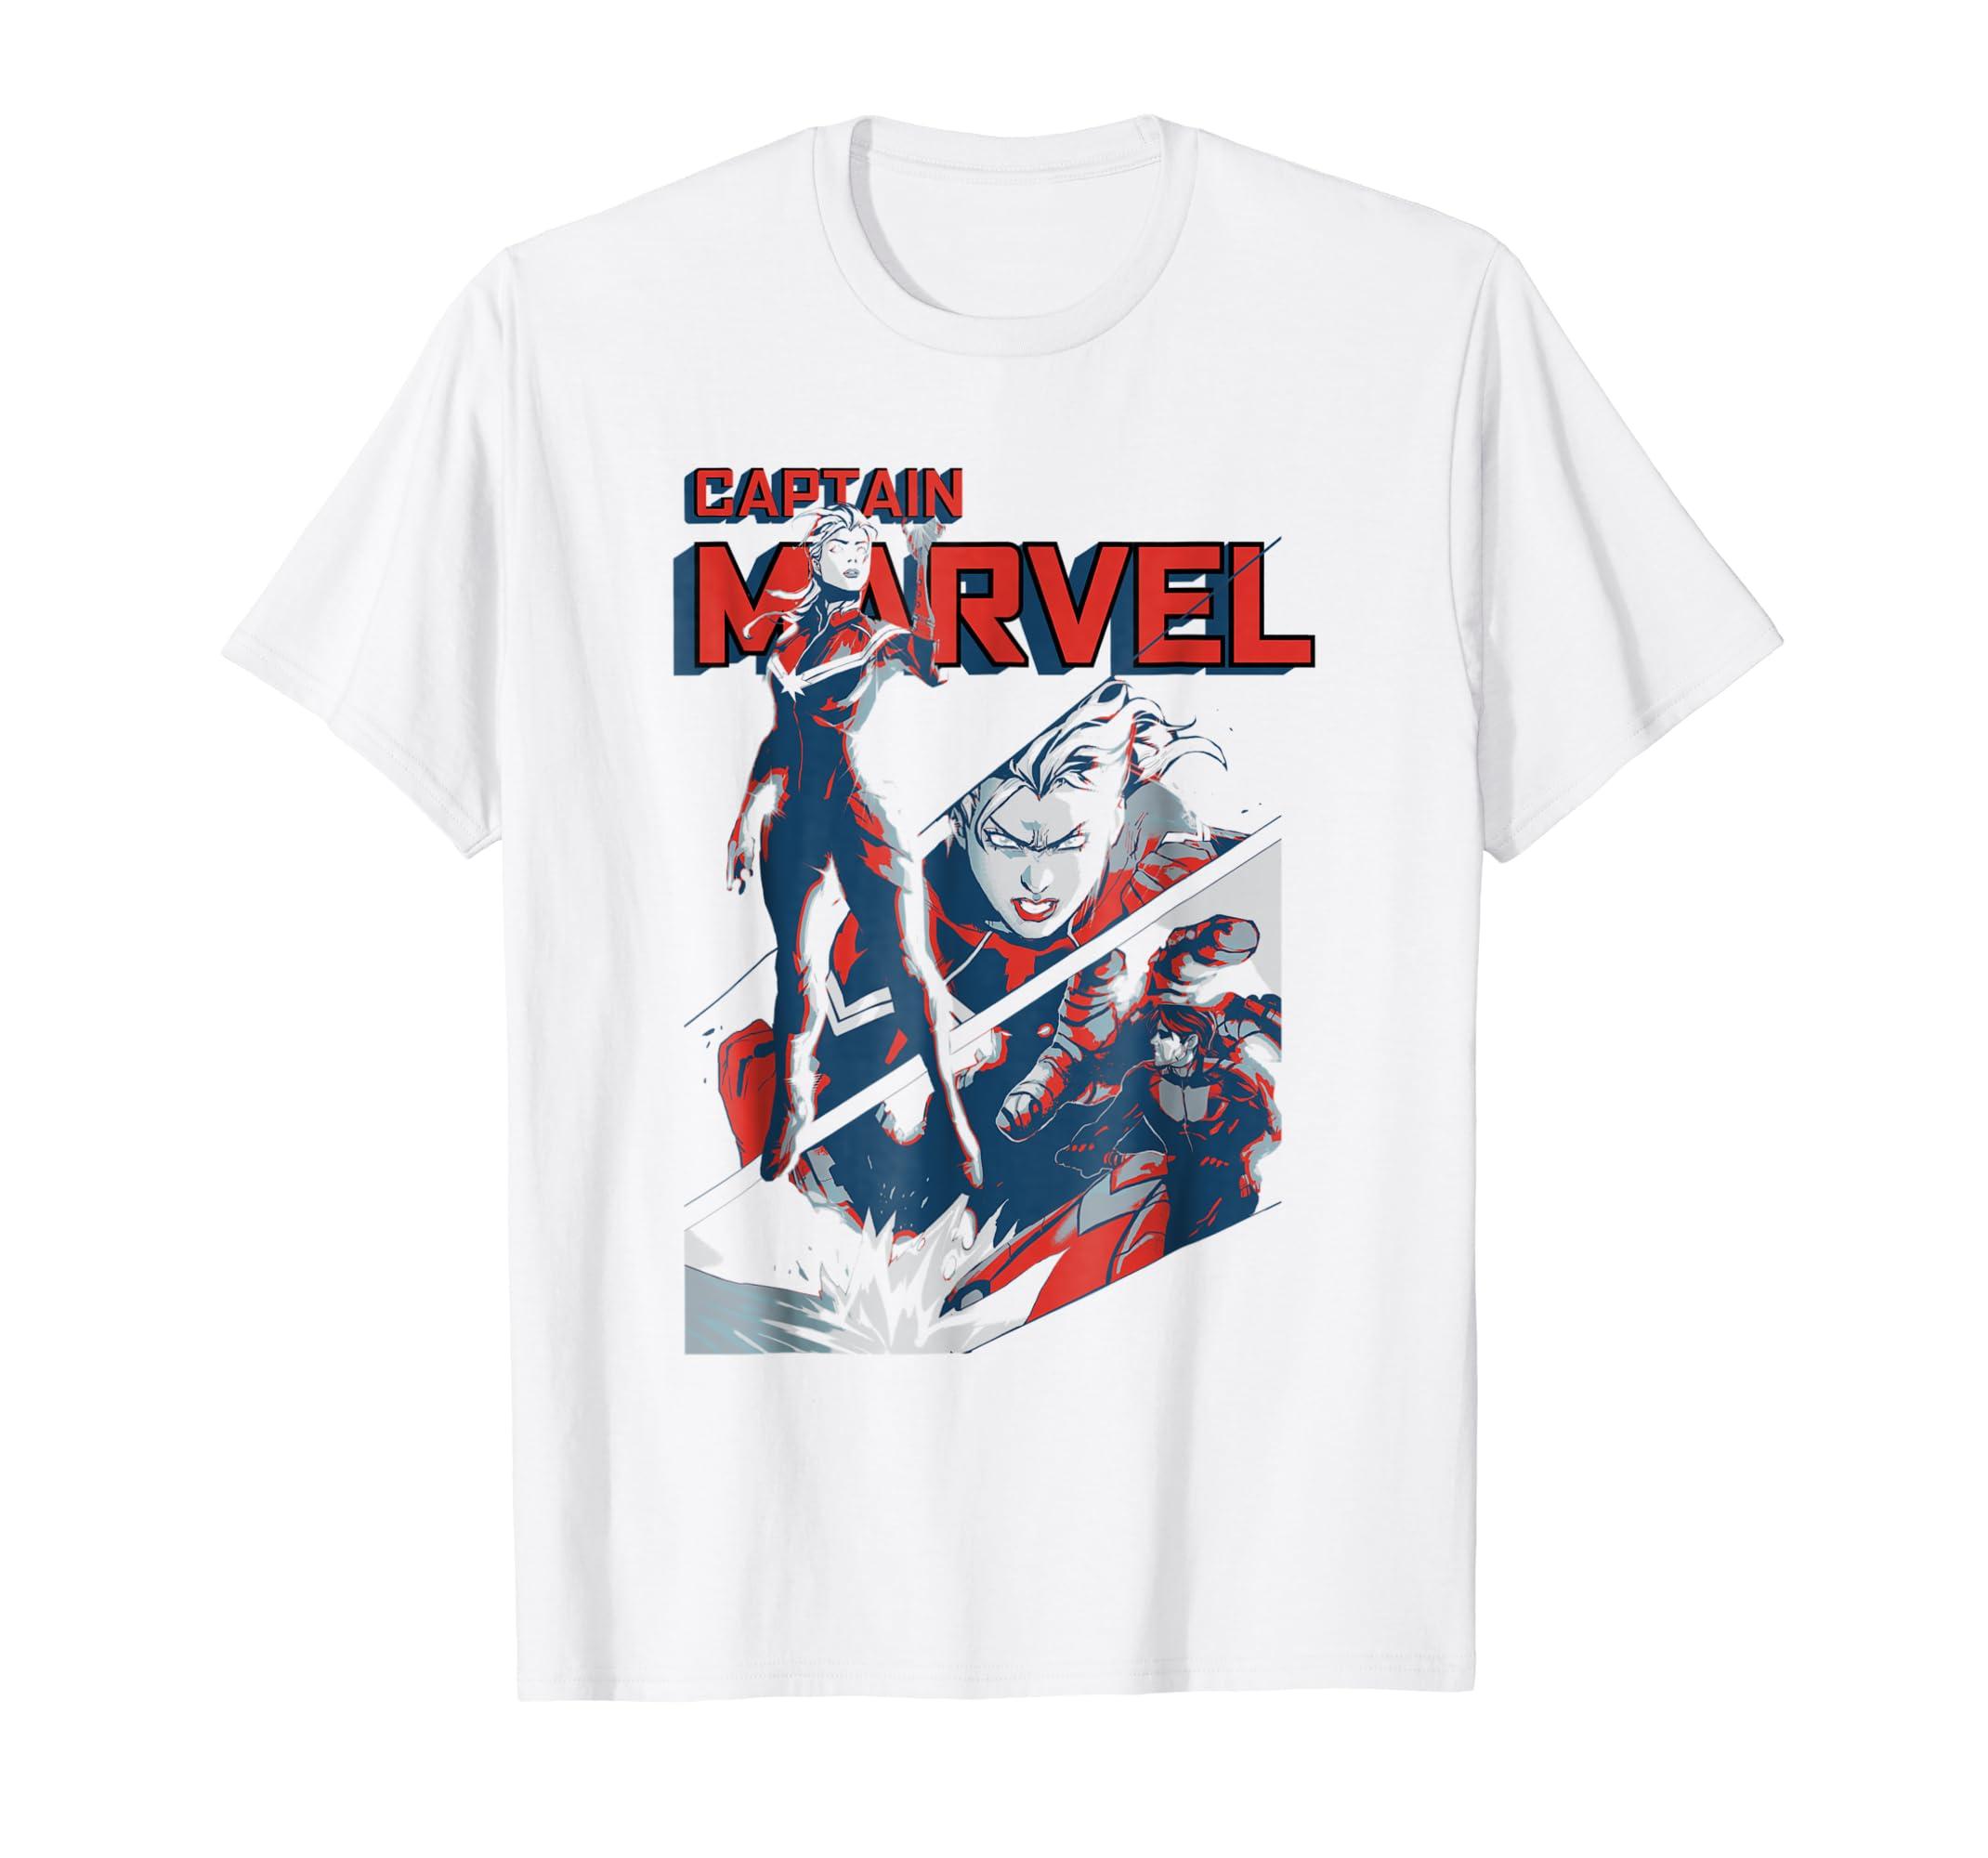 85db01f8c Amazon.com: Captain Marvel Earth's Mightiest Hero Intro Graphic T-Shirt:  Clothing